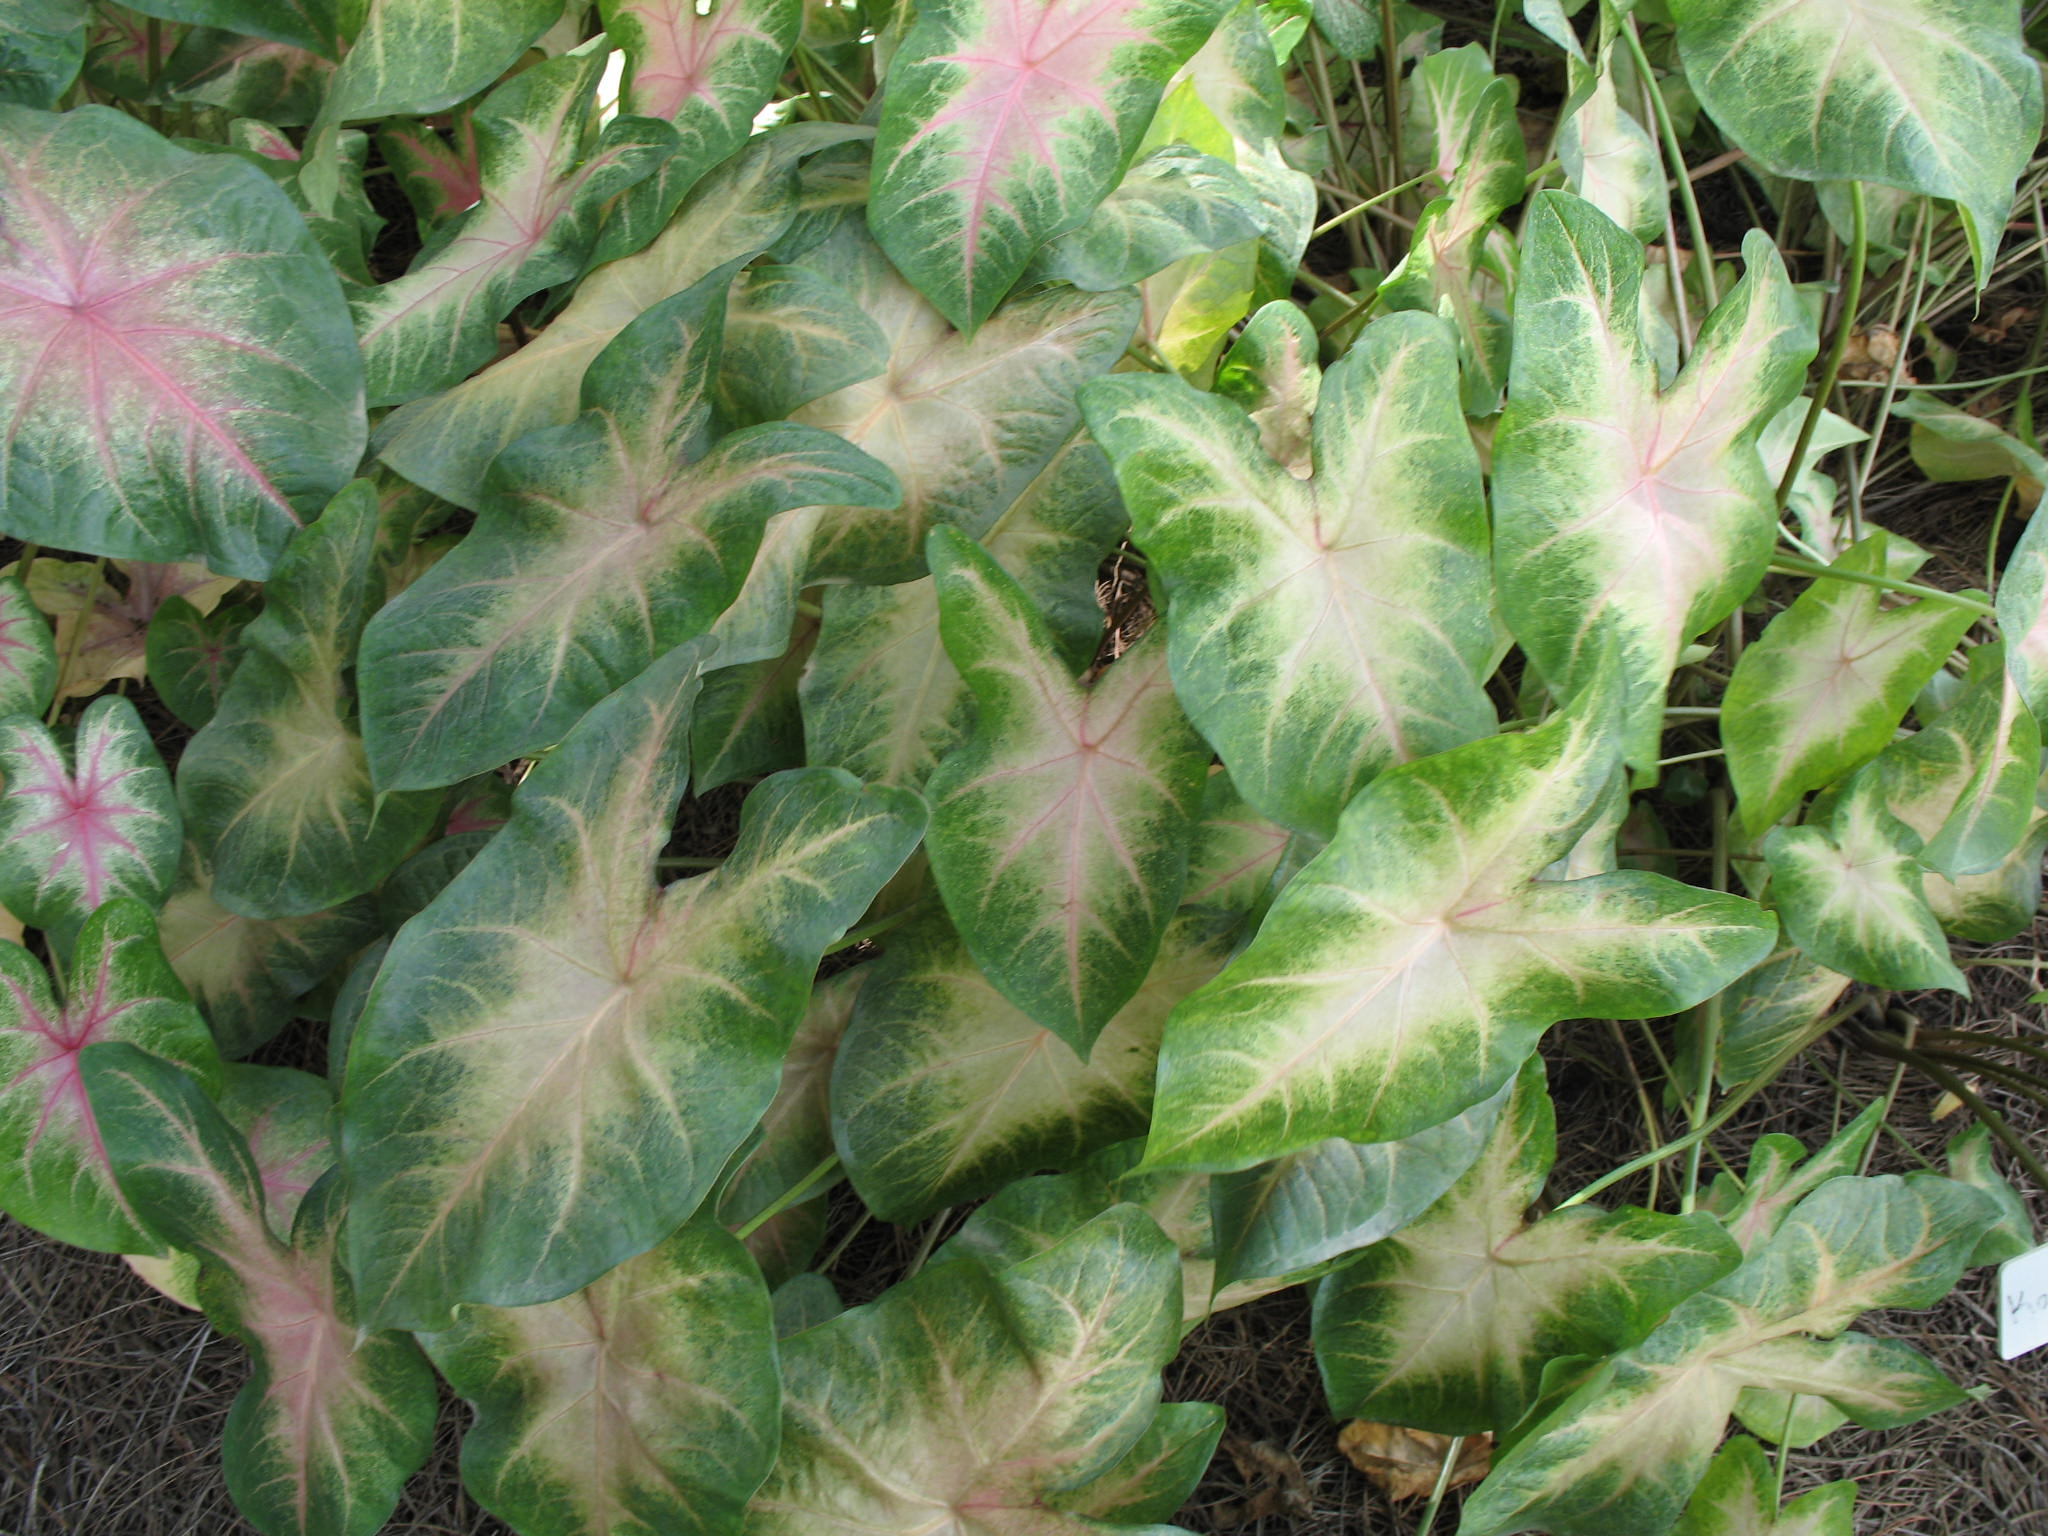 Caladium bicolor 'Kathleen'   / Caladium bicolor 'Kathleen'